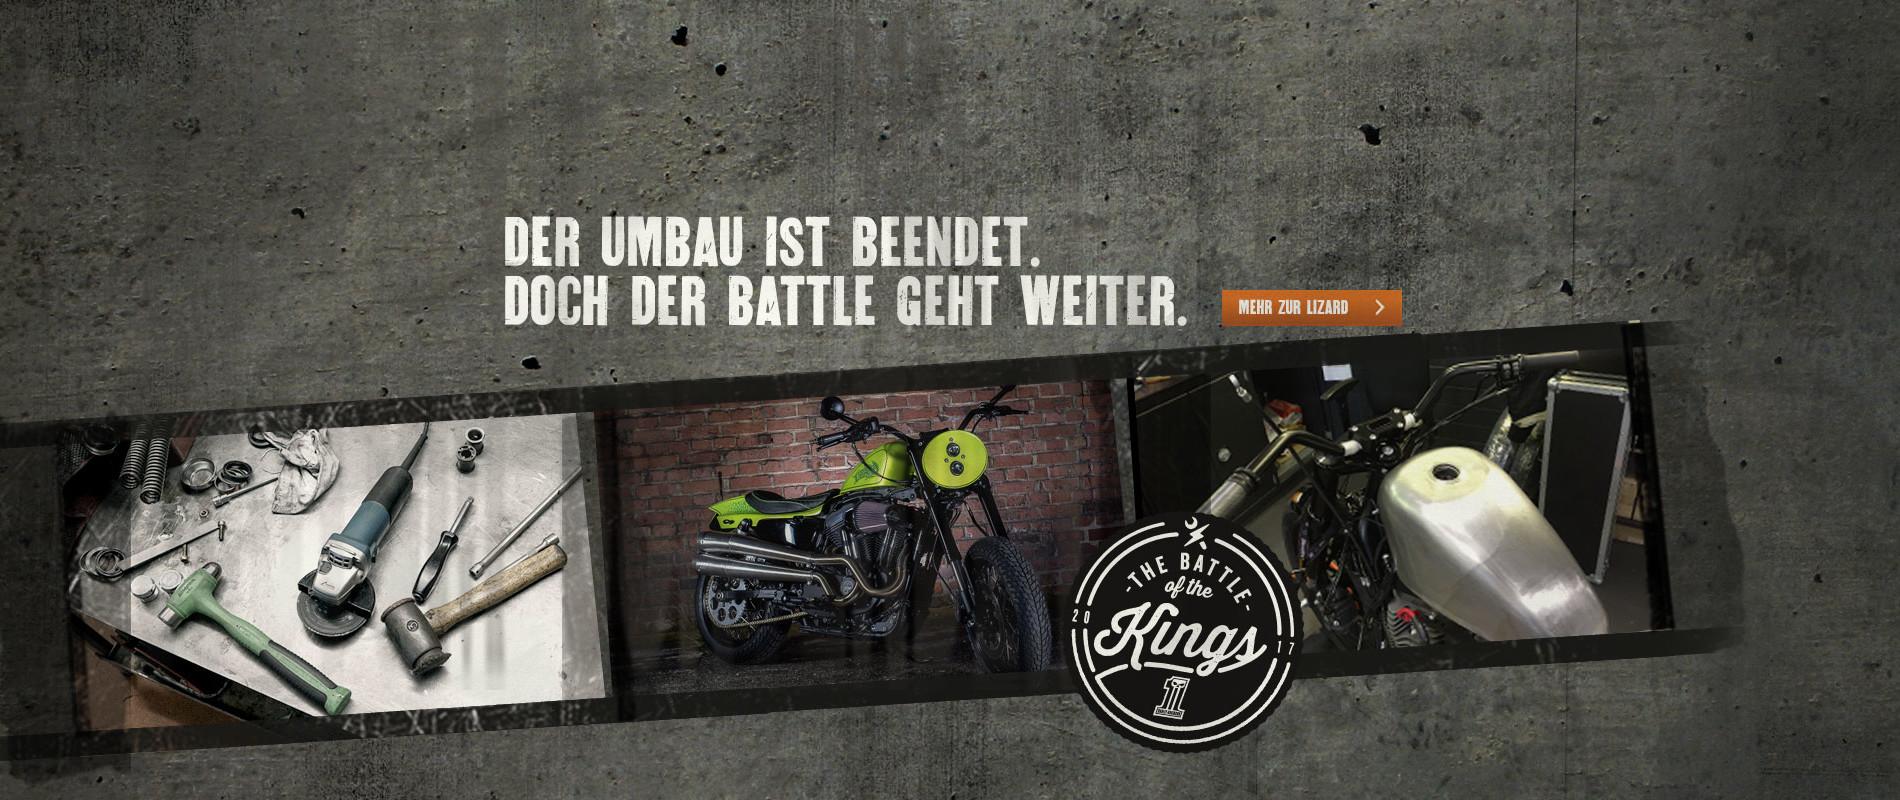 HD_Regensburg_Billboard_BOTK2017_2